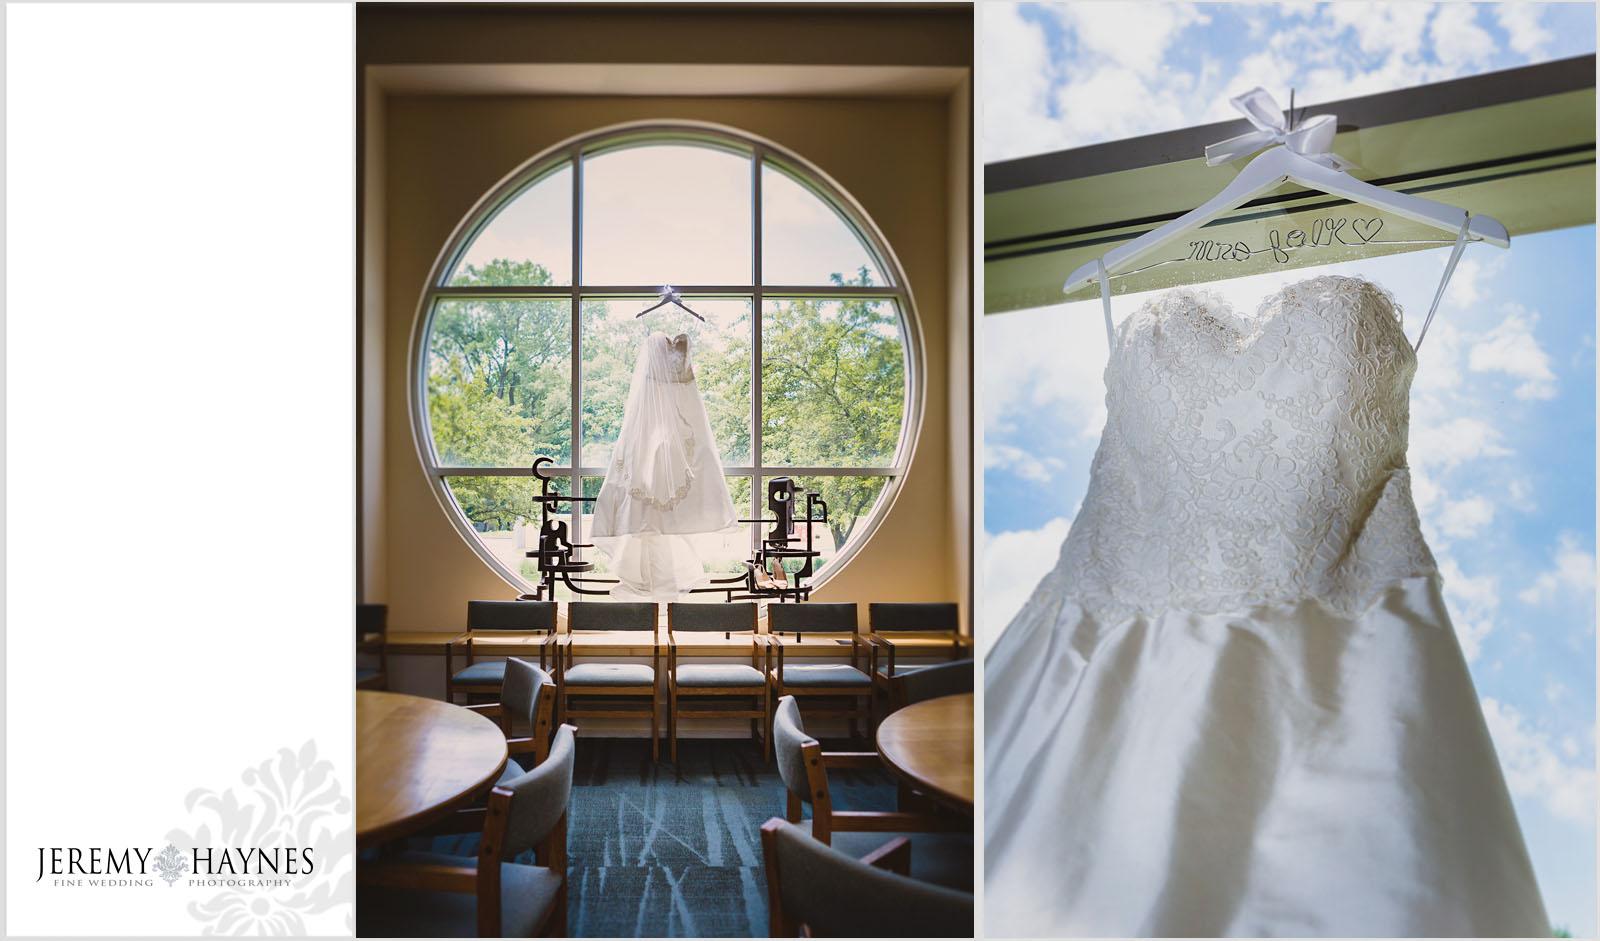 2 Indianapolis Art Center Indianapolis, IN Beautiful Wedding Preparation Photos.jpg